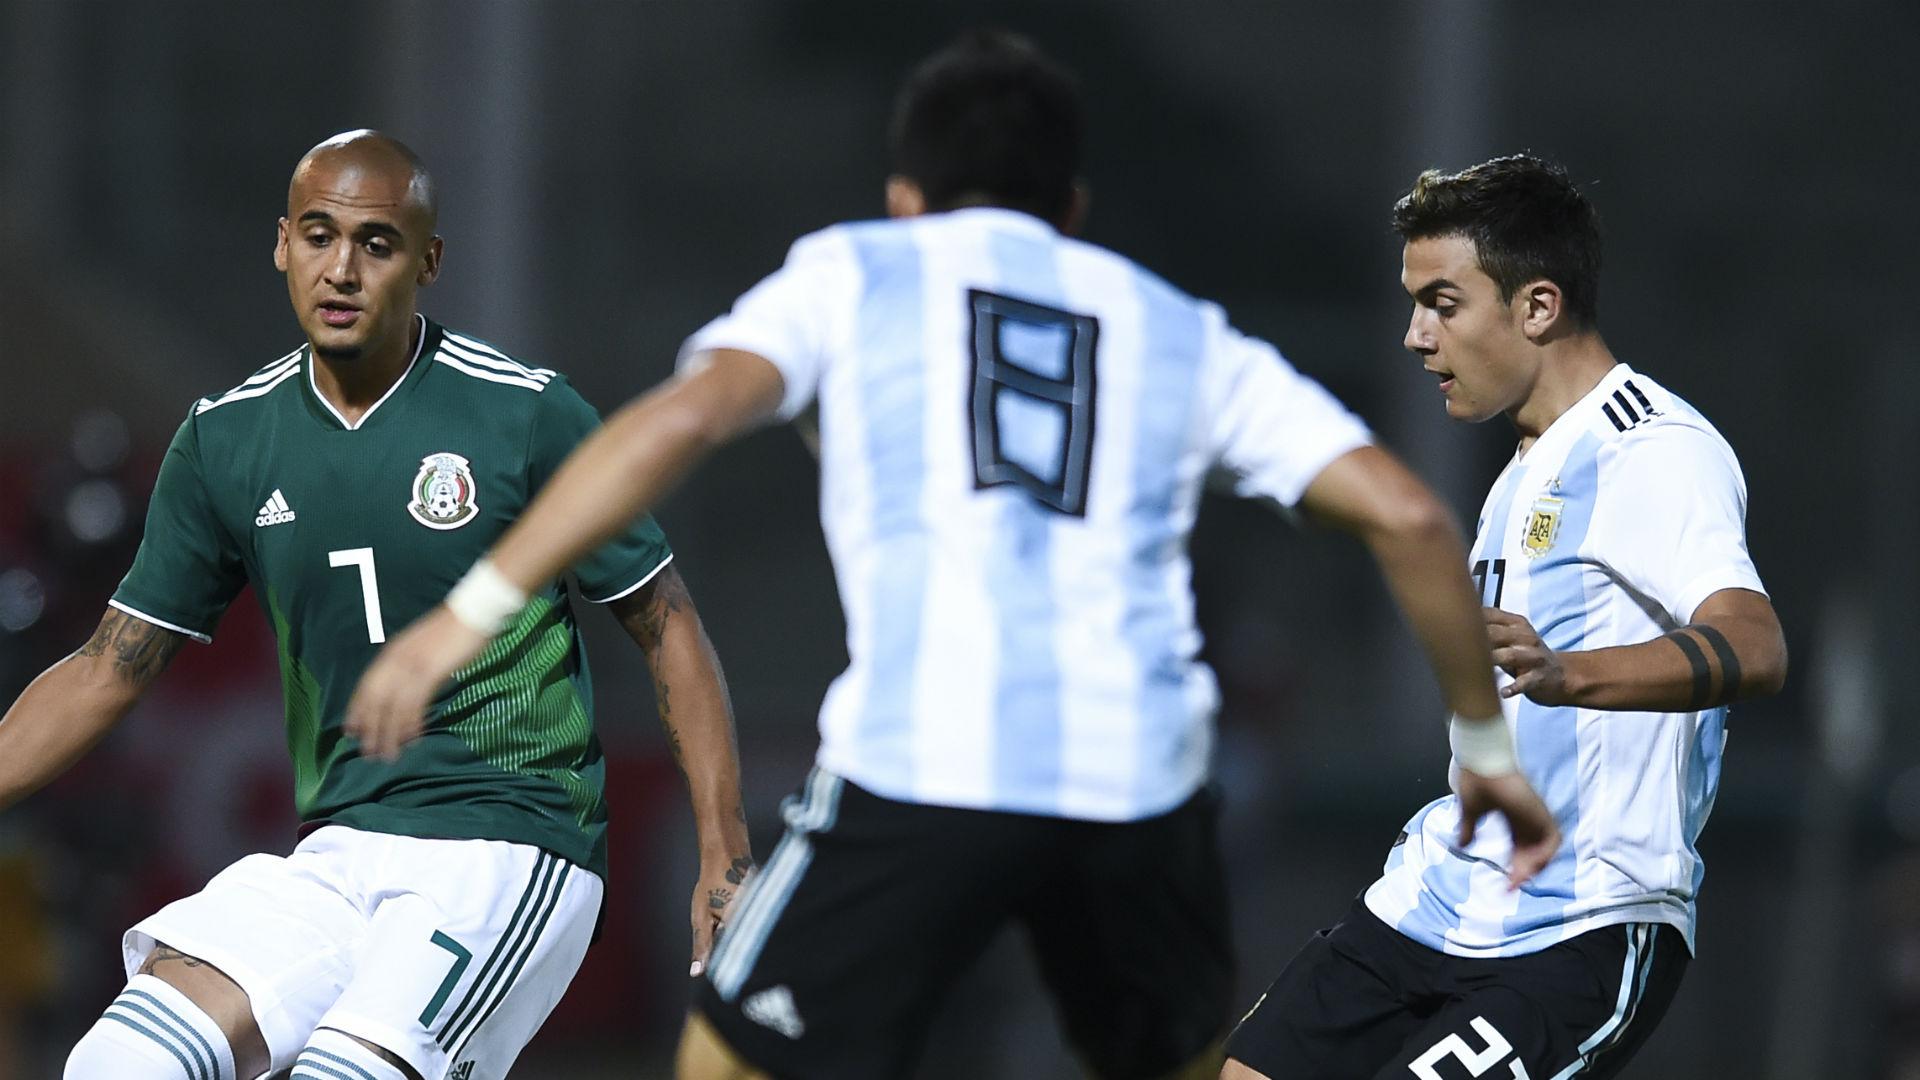 Dybala impressed by Argentina's improved spirit